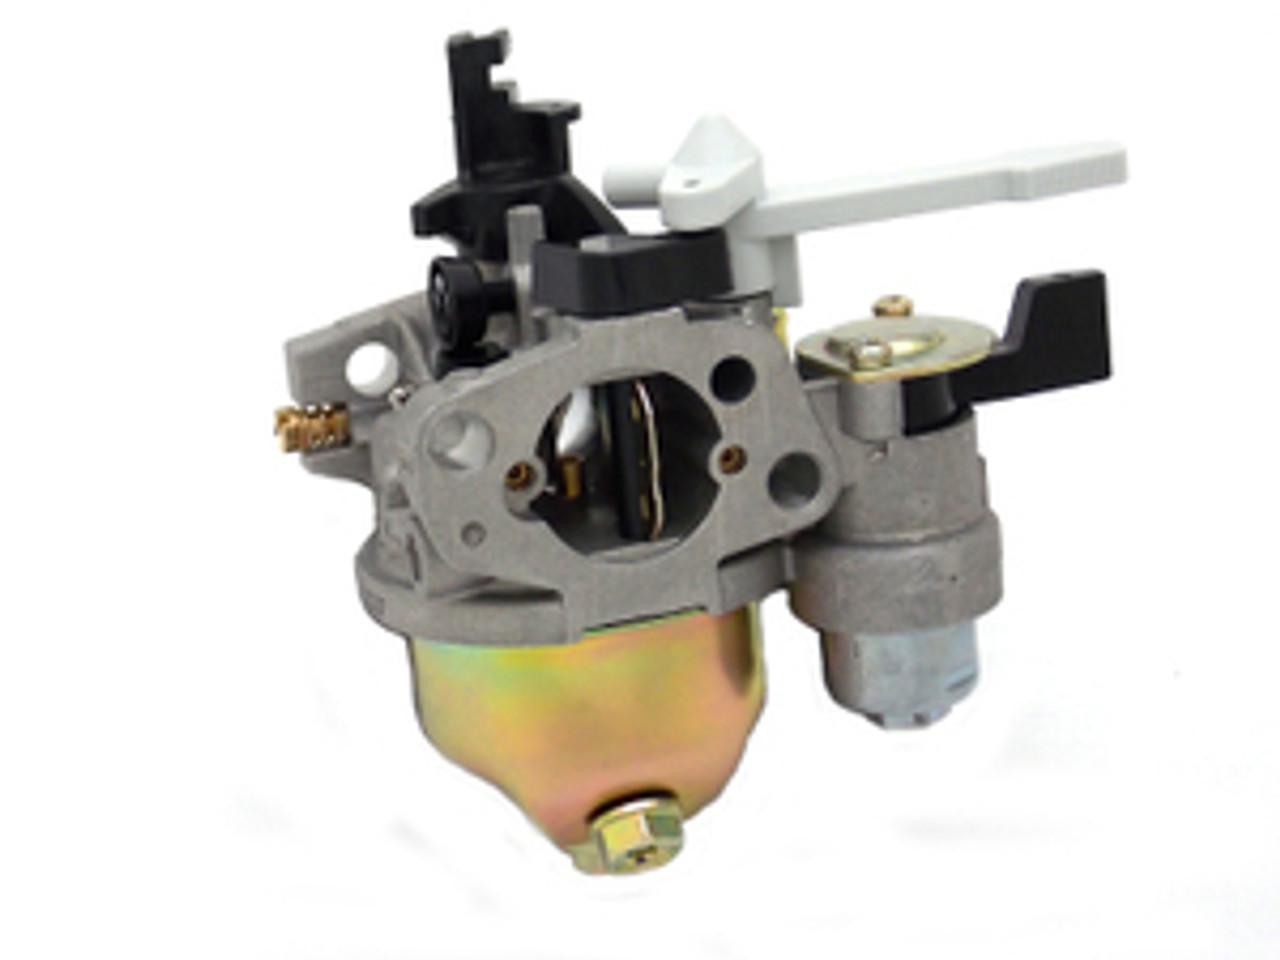 DJ-2224 Pro .615 Blueprinted AKRA/NKA Racing Carburetor